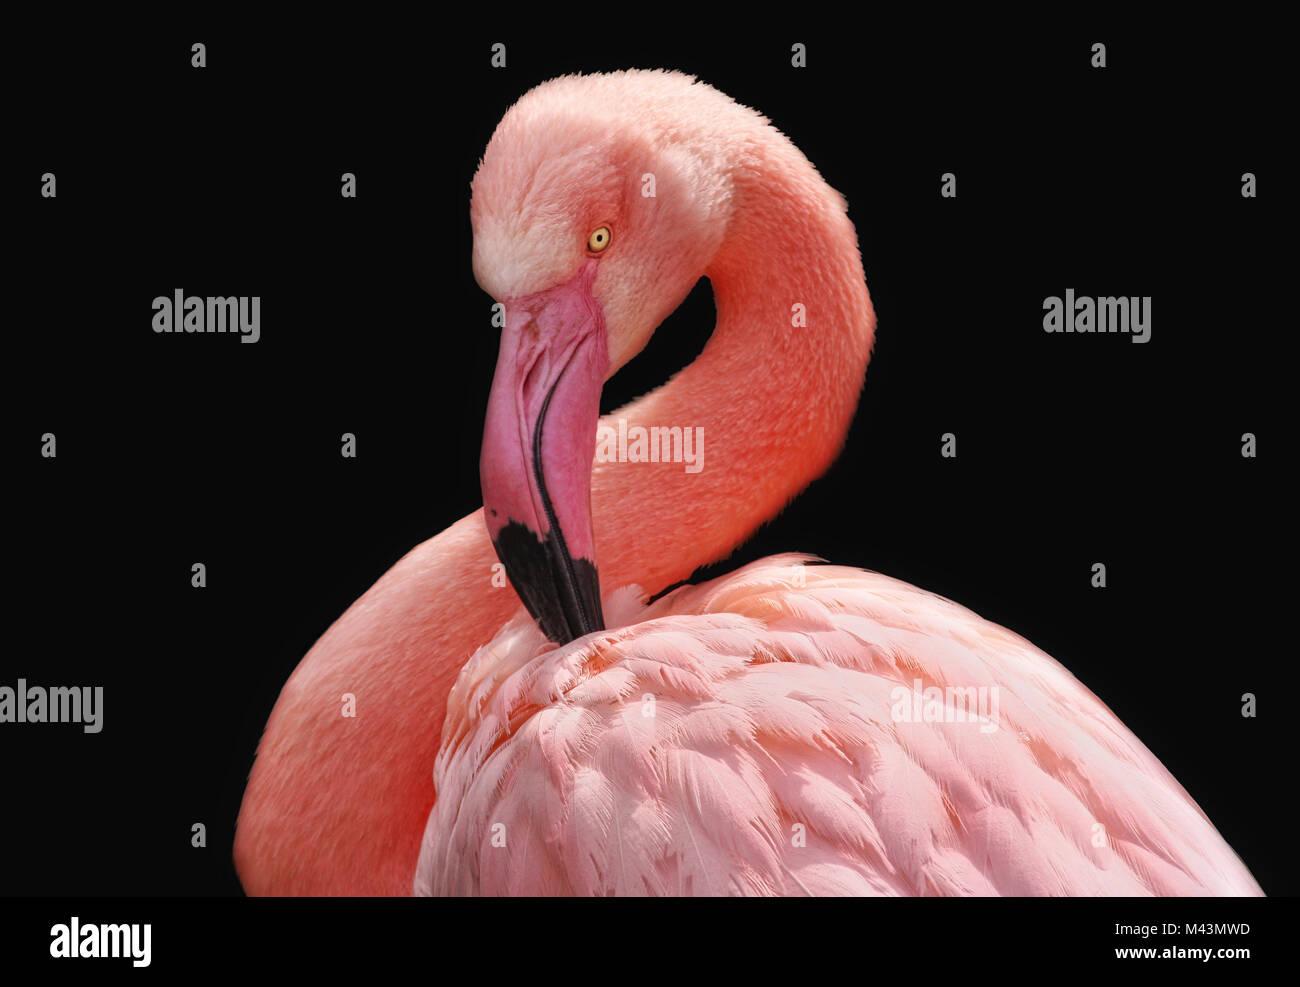 flamingo - Stock Image